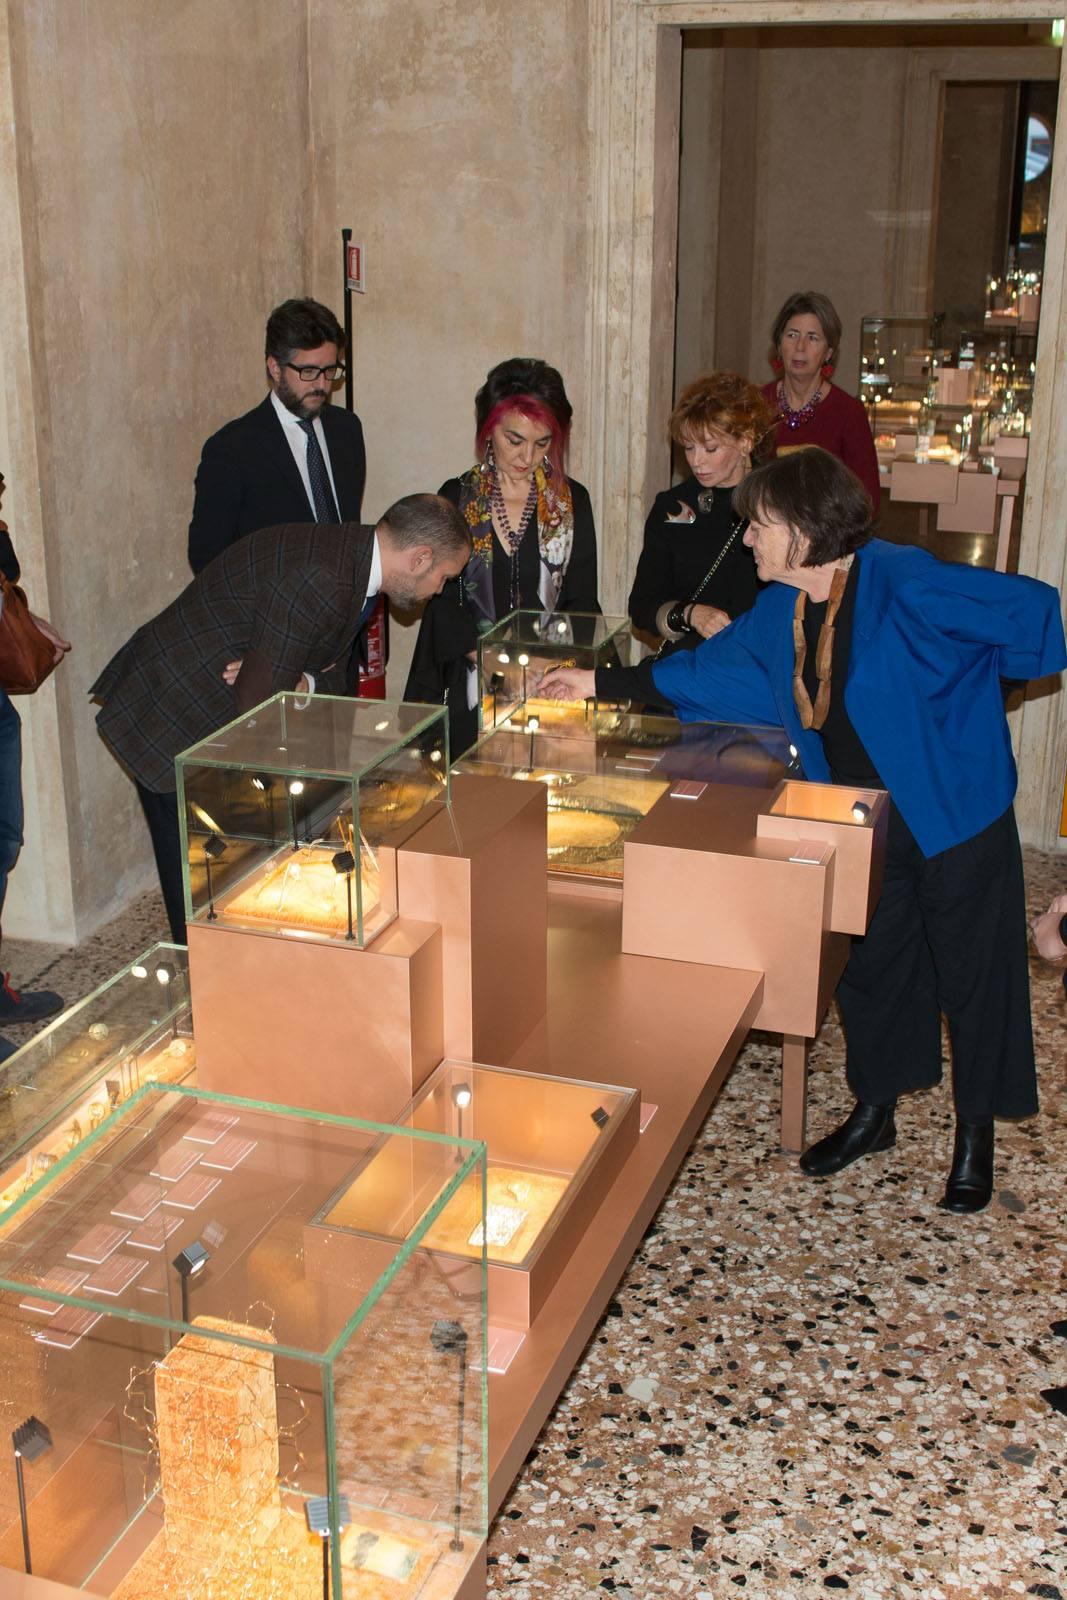 Museo del Gioiello, Sala Arte, 2018. Foto met dank aan Galerie Marzee©